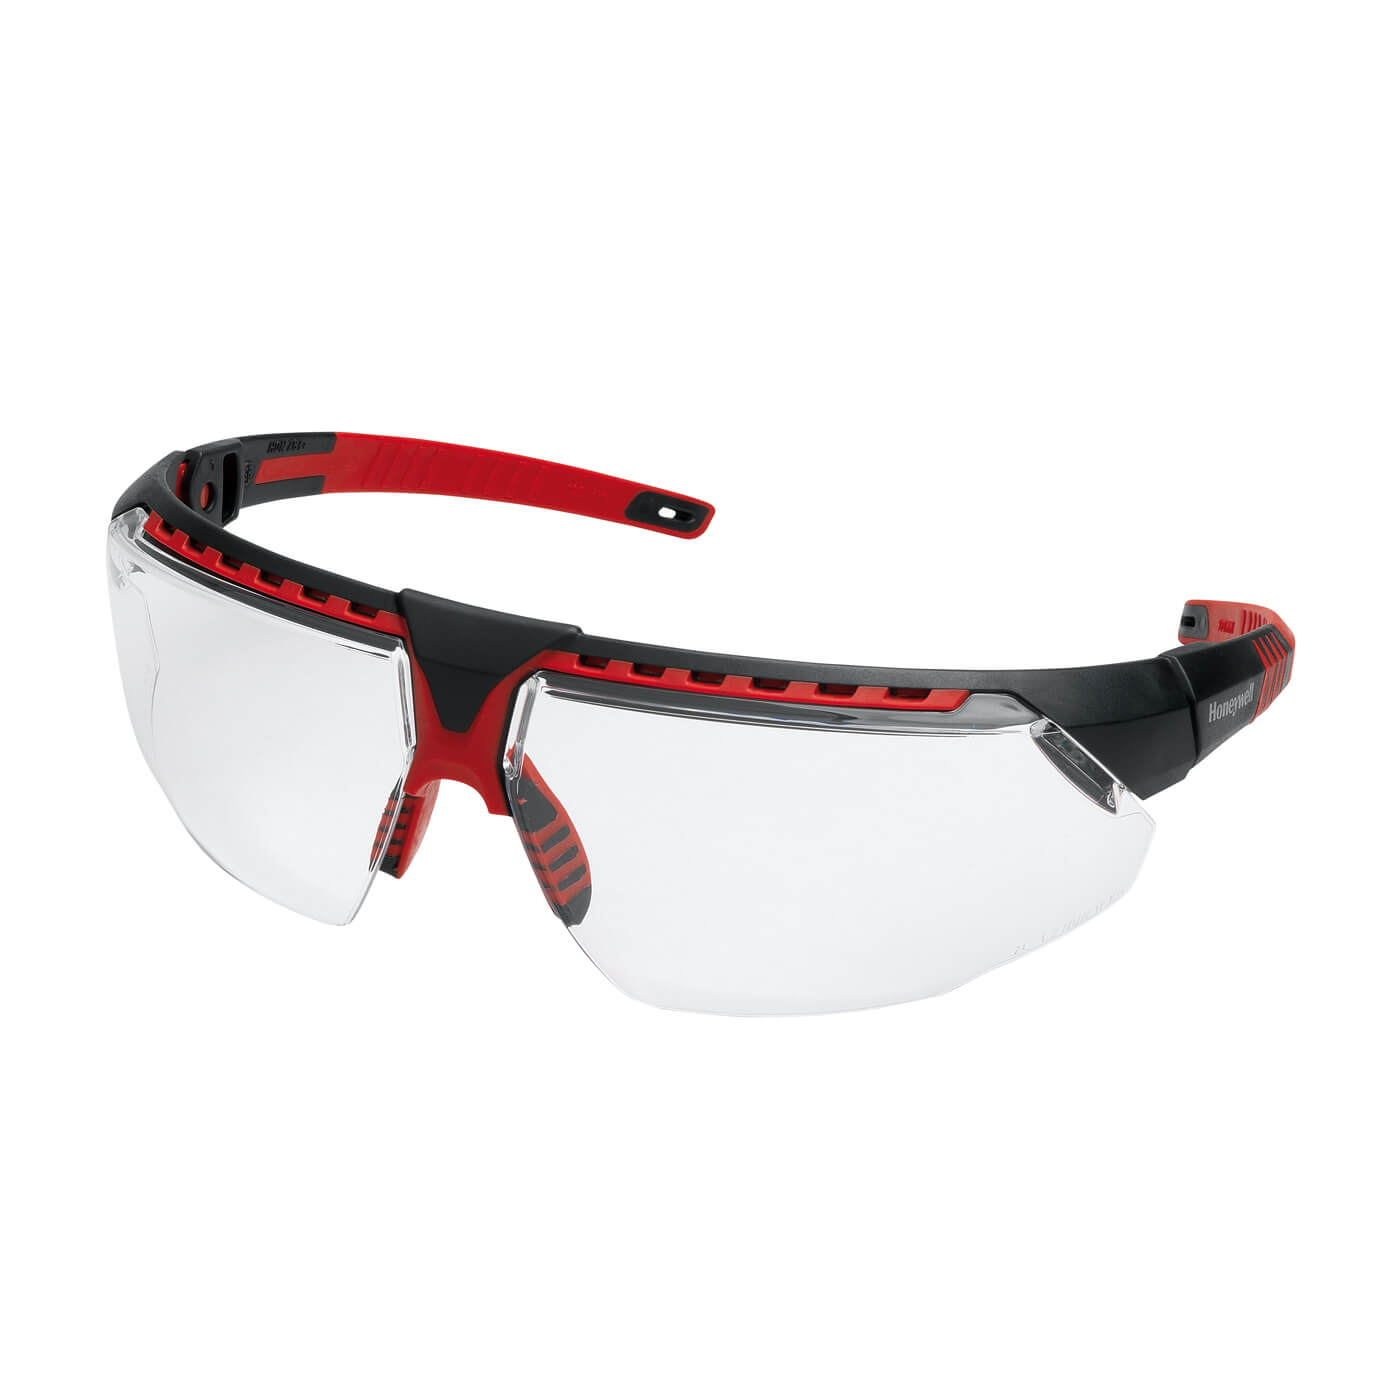 Okulary ochronne Avatar 1034836 Honeywell bezbarwna soczewka